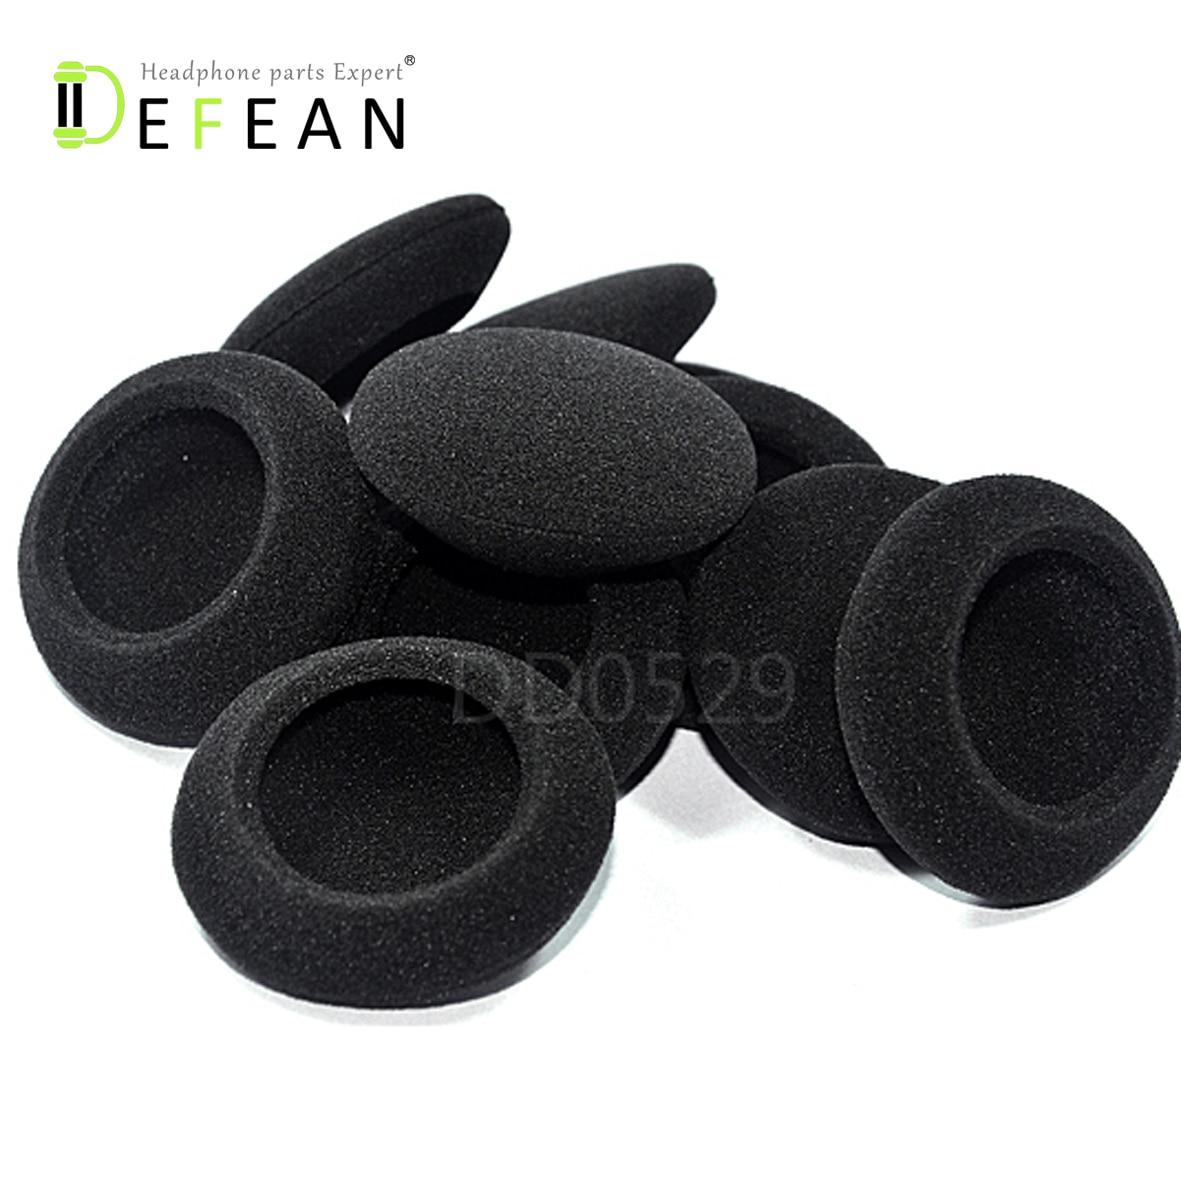 8 pairs 45mm foam ear pads sponge earpads headphone cover for headset 1.77 inch